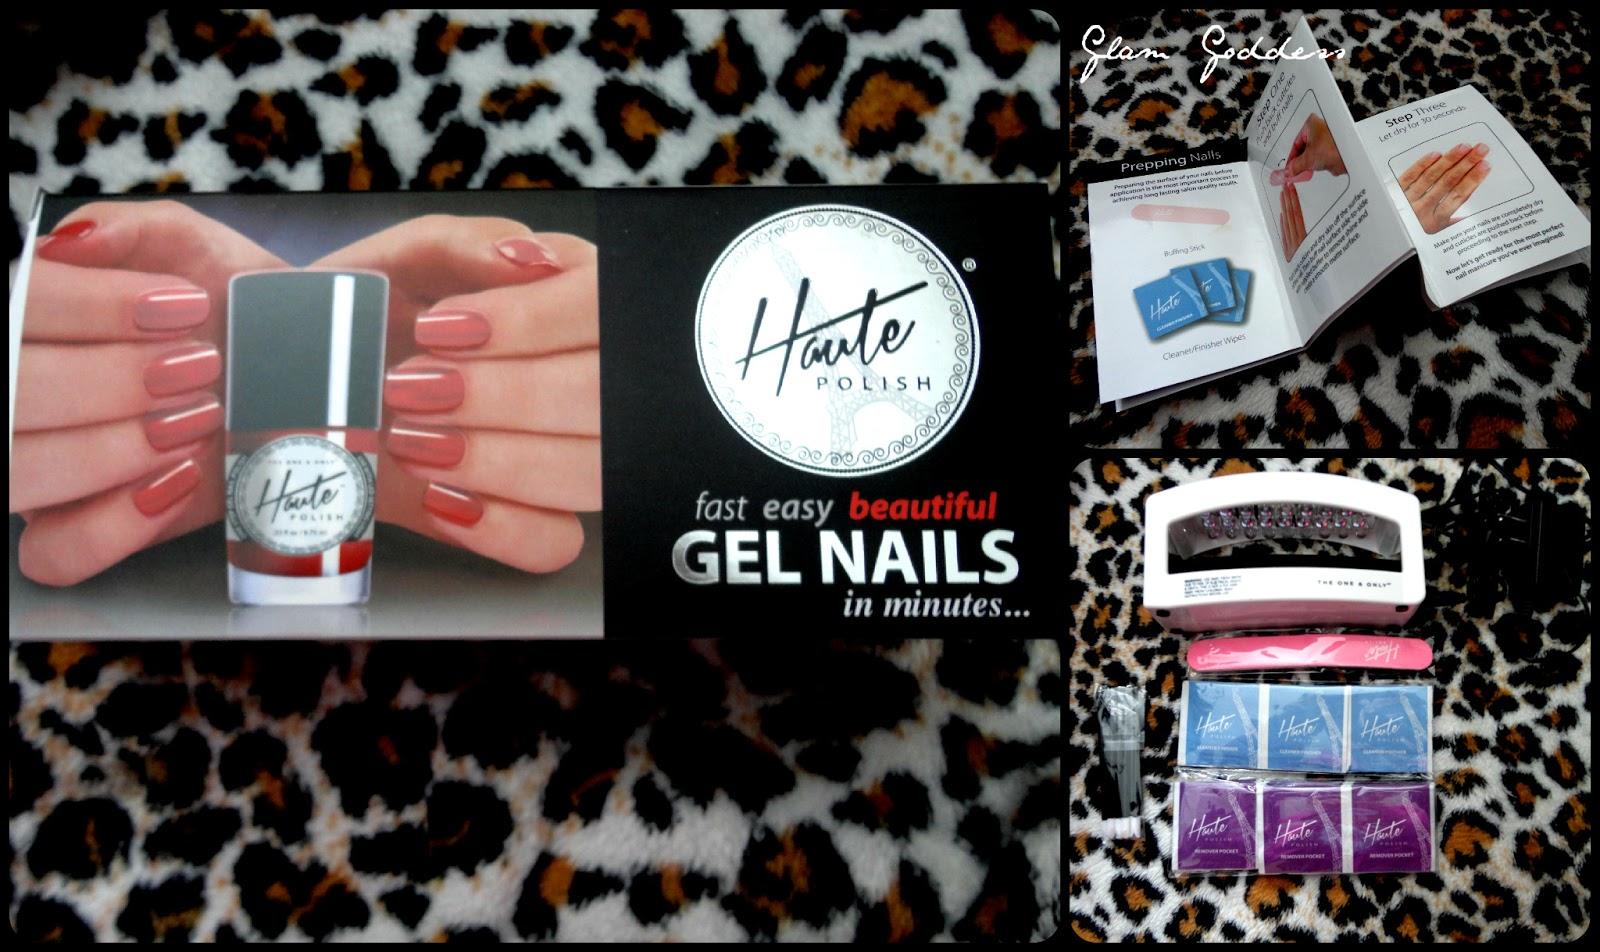 The Glam Goddess: Haute Polish Gel Nails Review